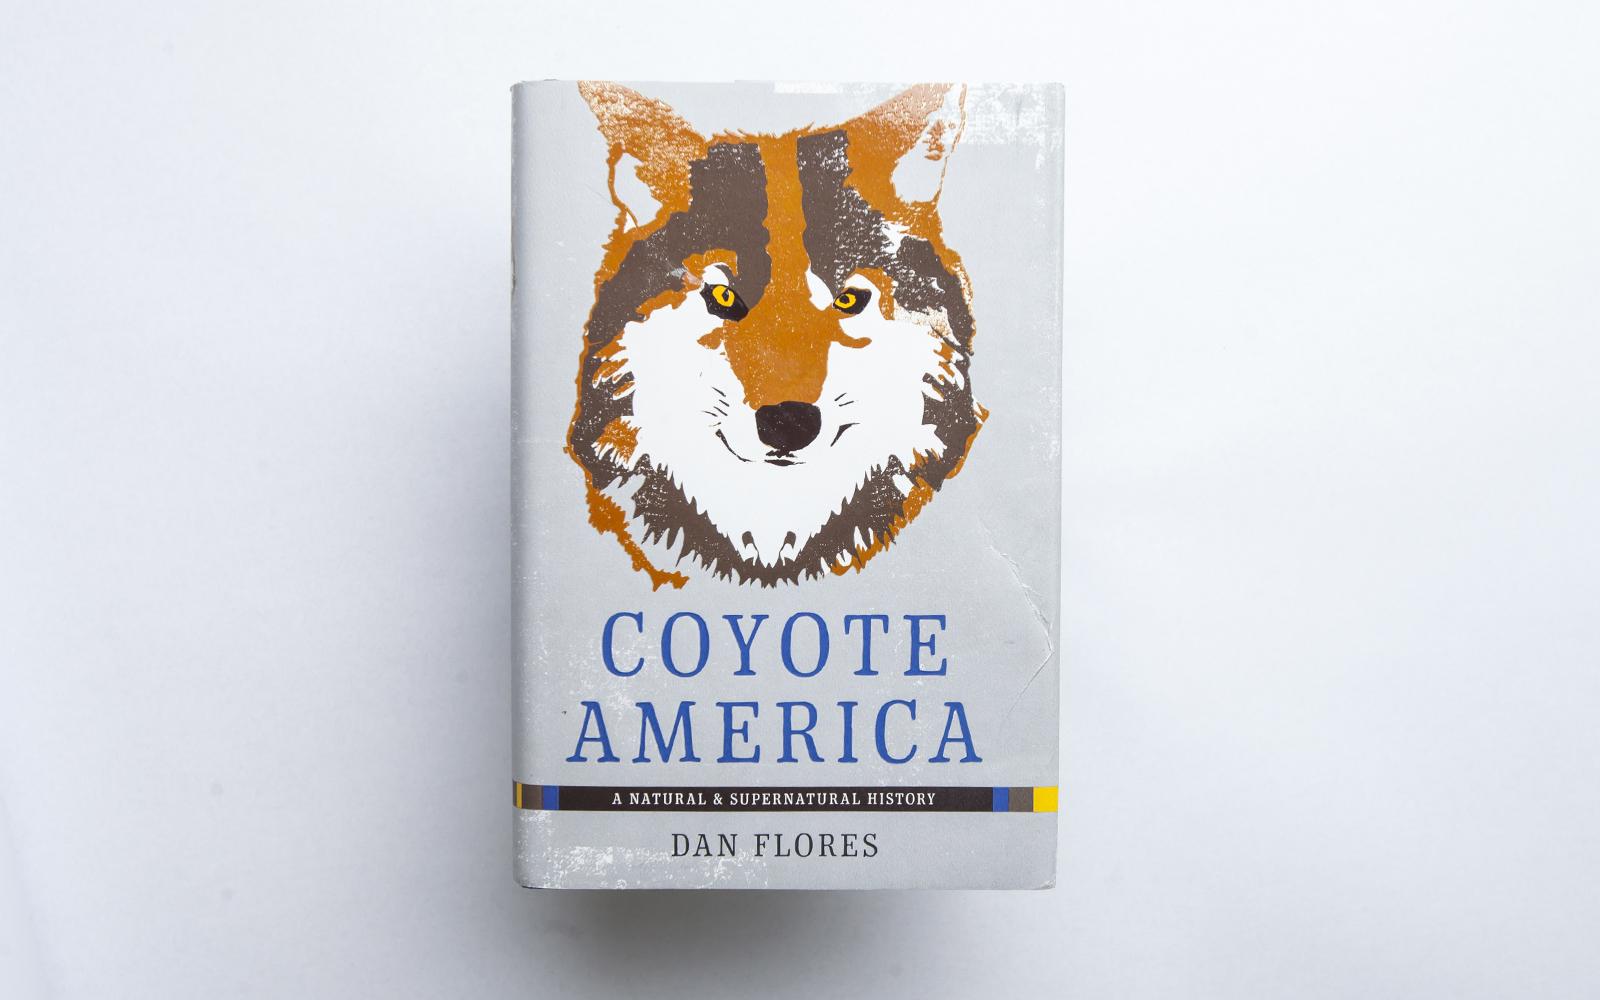 Book Coyote America